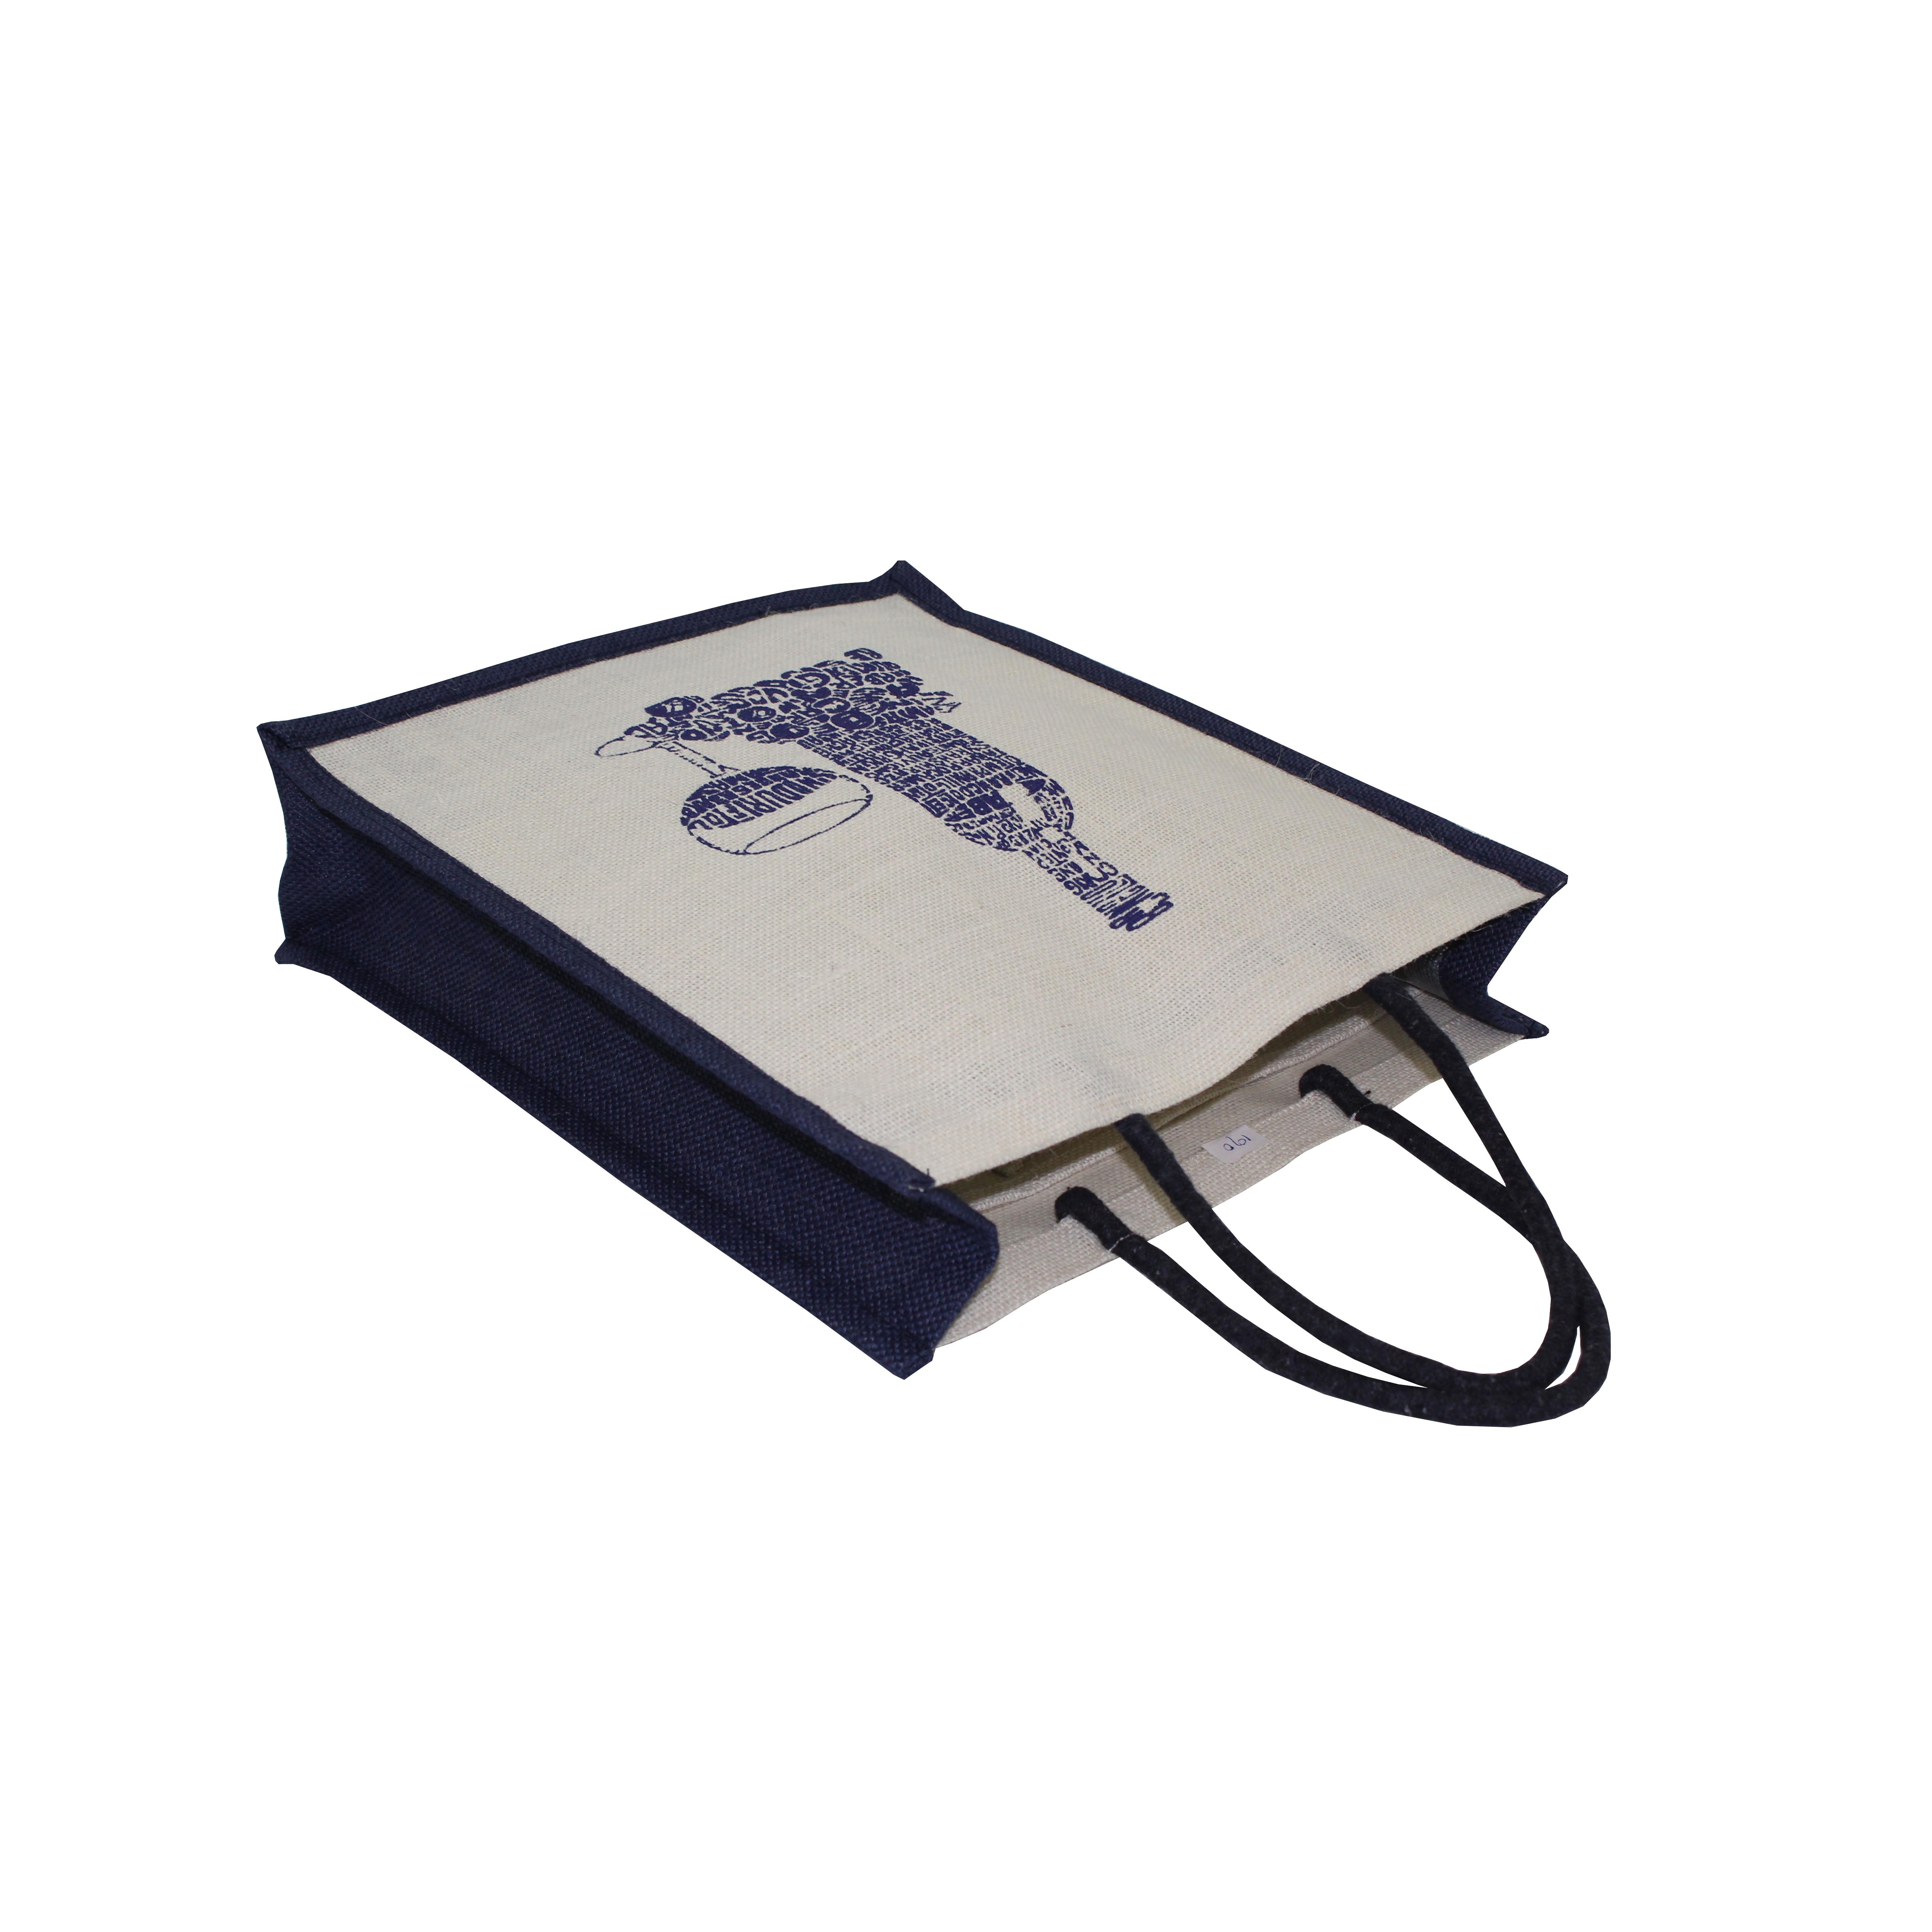 PP Laminated Jute Bag With Rope Handle